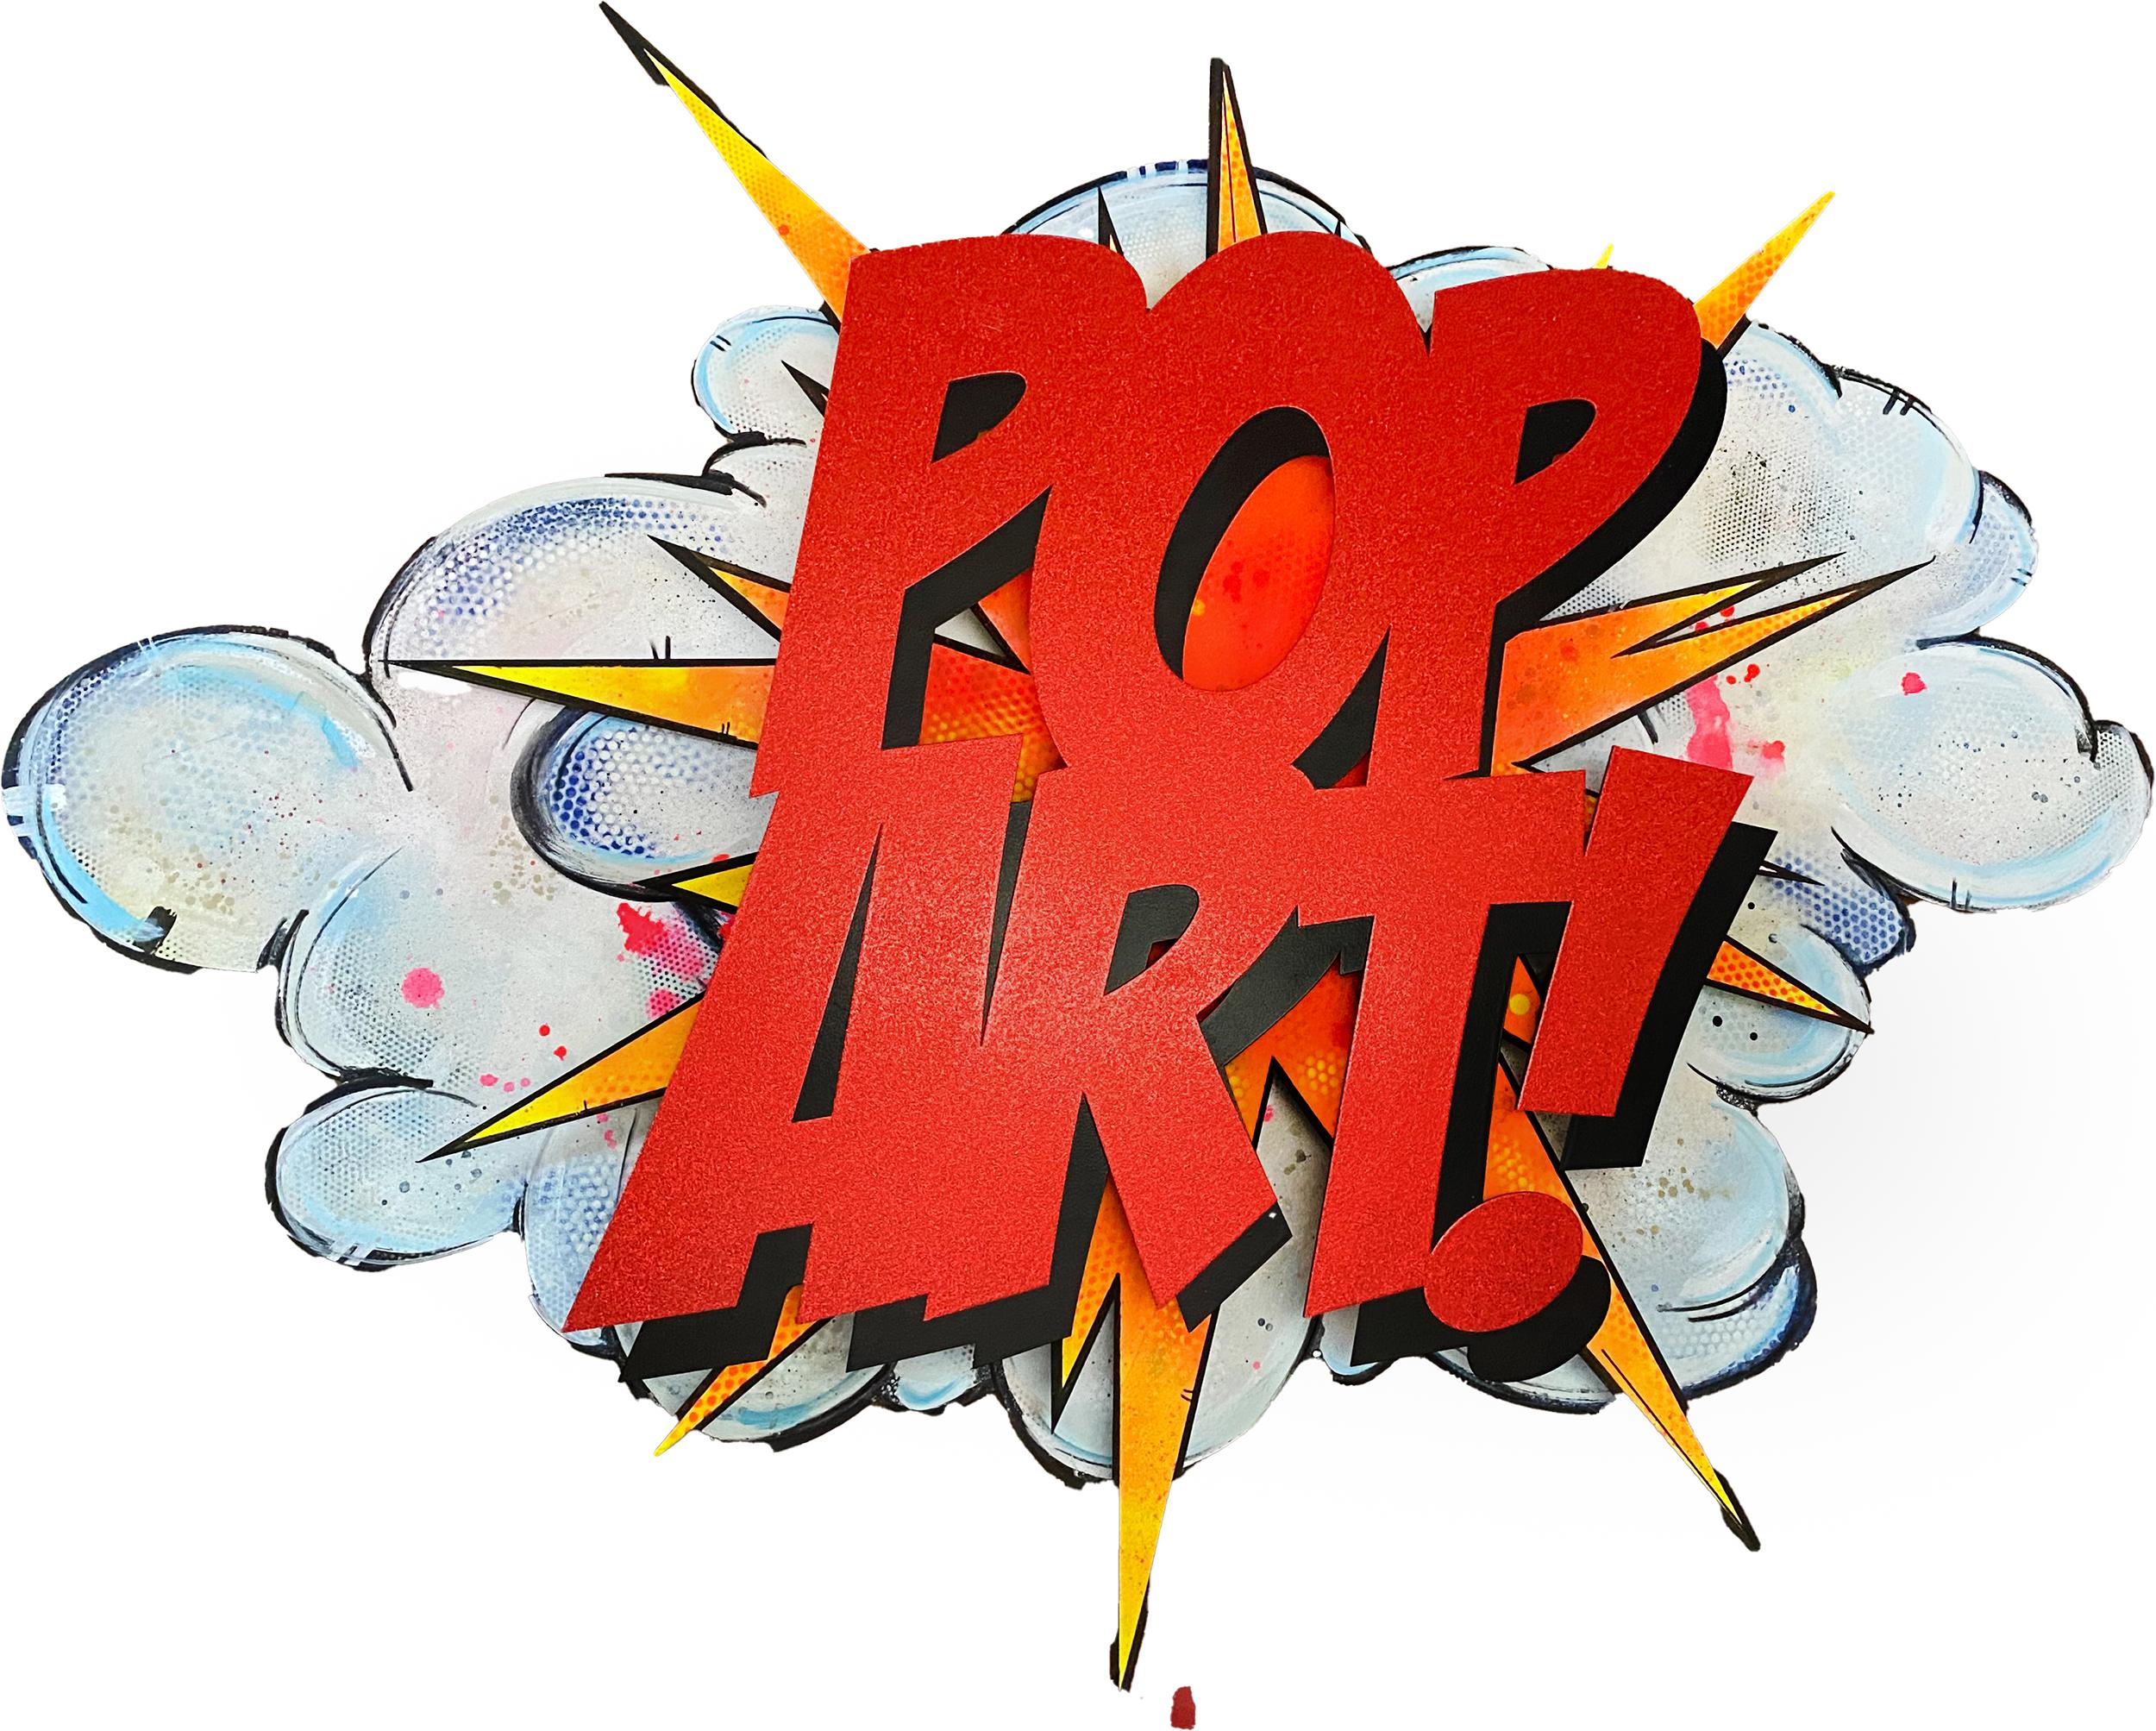 Tom Boston - Pop Art Explosion , 8022-006-440